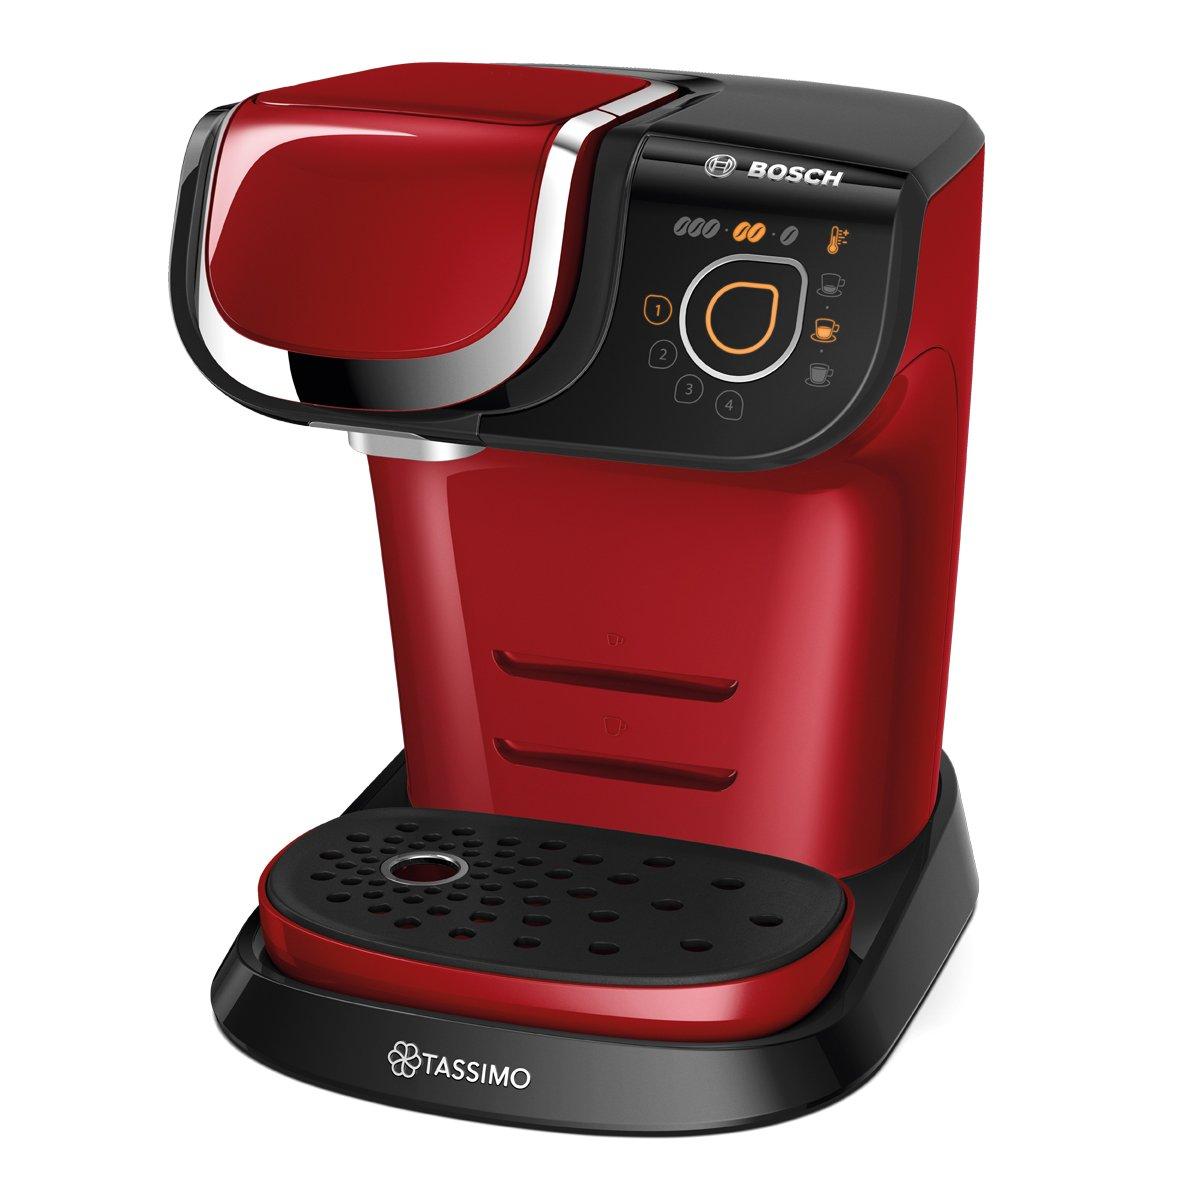 Bosch TAS6003 Tassimo My Way - Cafetera automática de cápsulas, interfaz SensorTouch, 1500 W